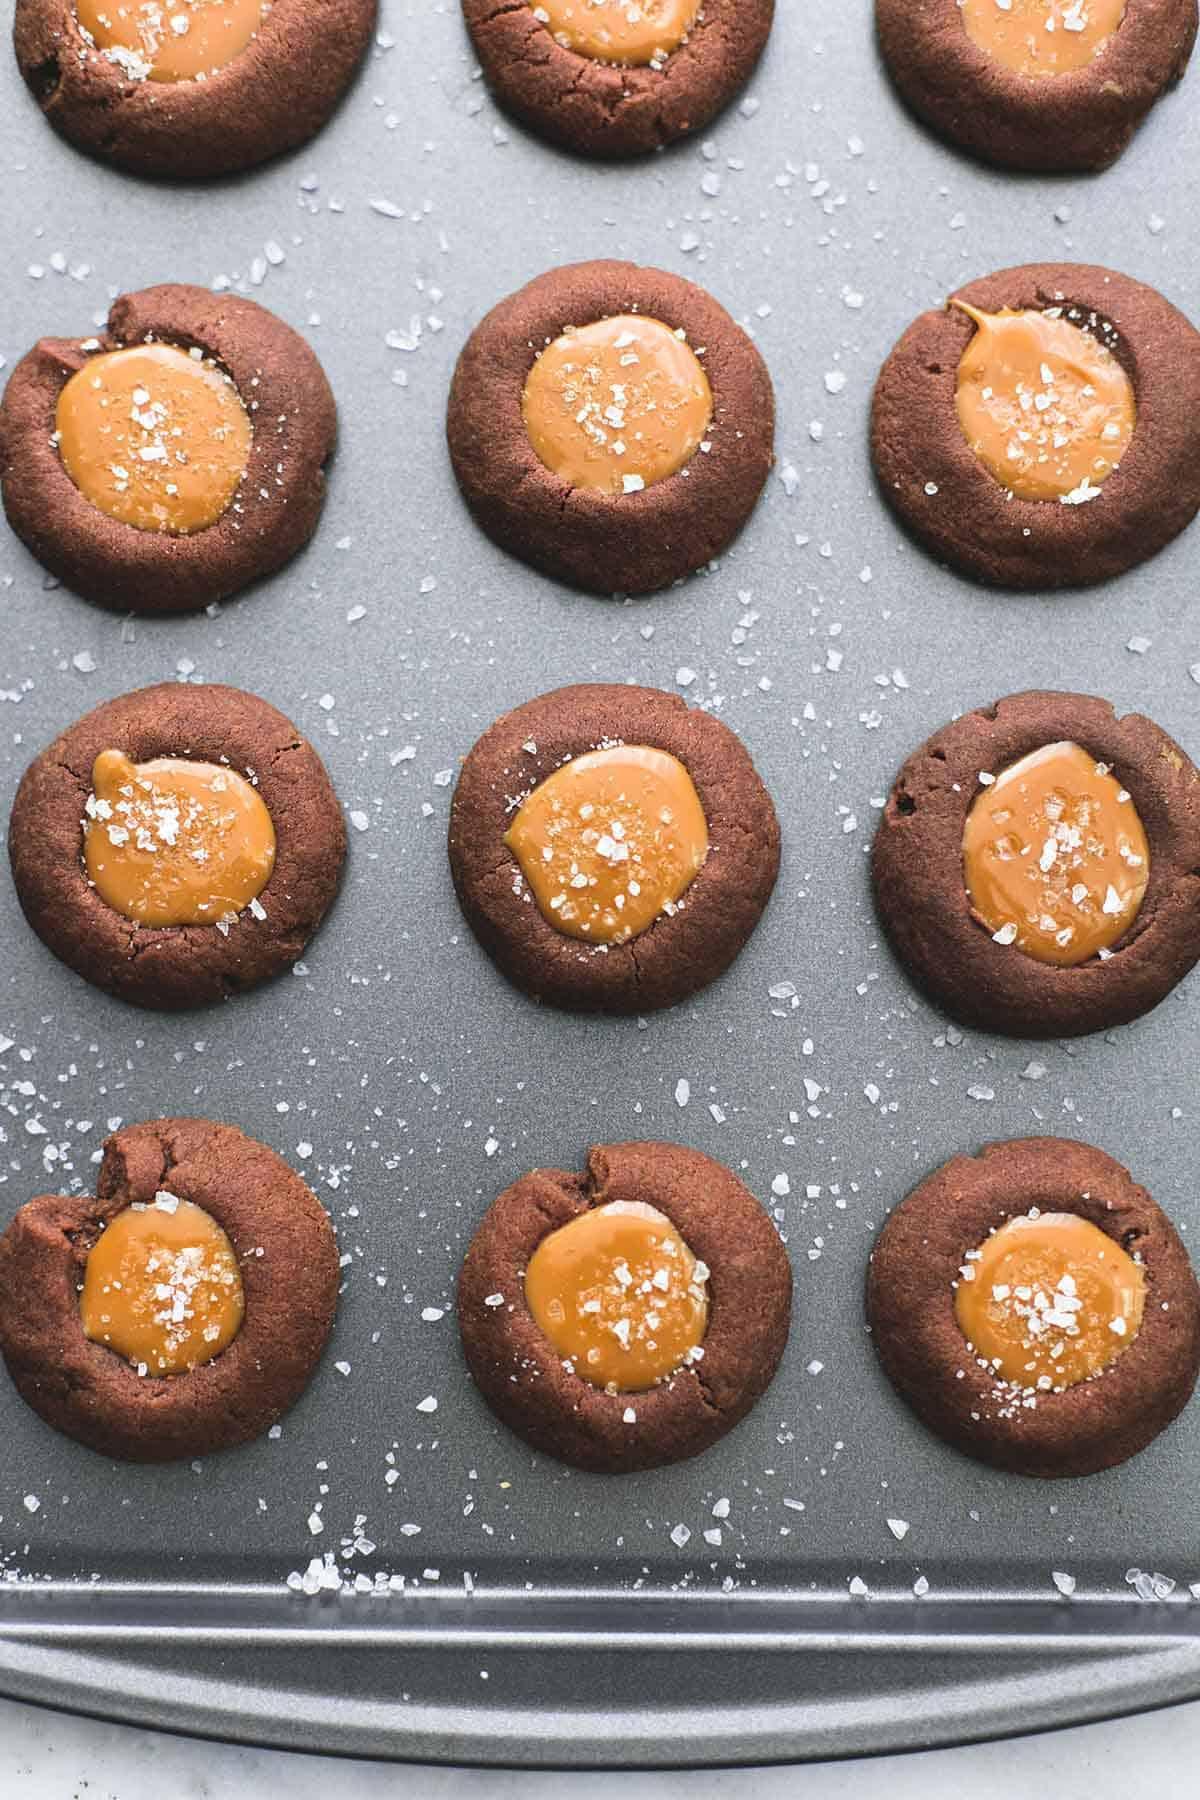 Salted Caramel Chocolate Thumbprint Cookies | lecremedelacrumb.com